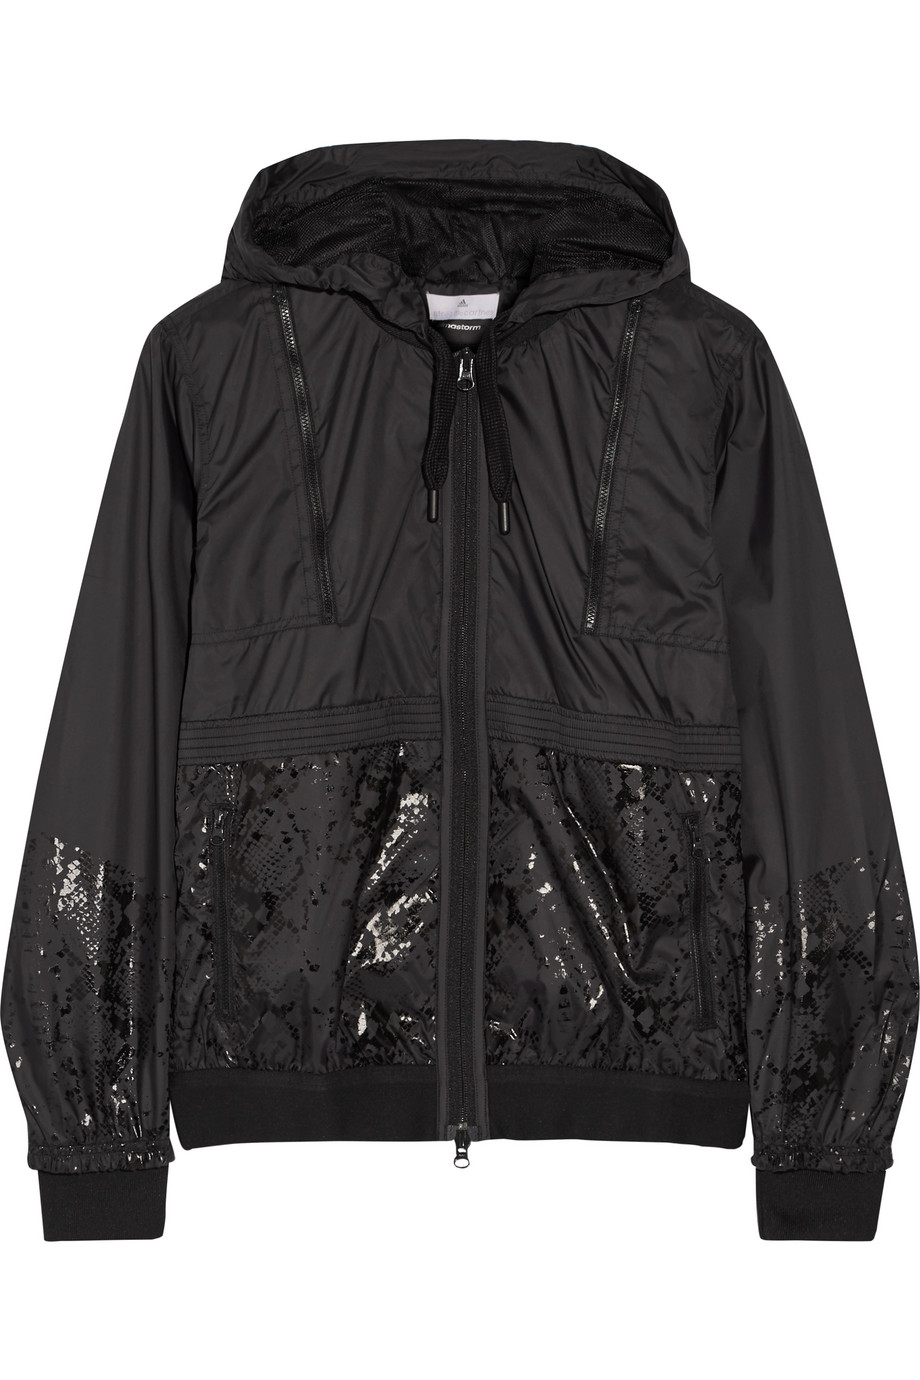 Hooded Shell Jacket, Adidas by Stella Mccartney, Black, Women's, Size: L